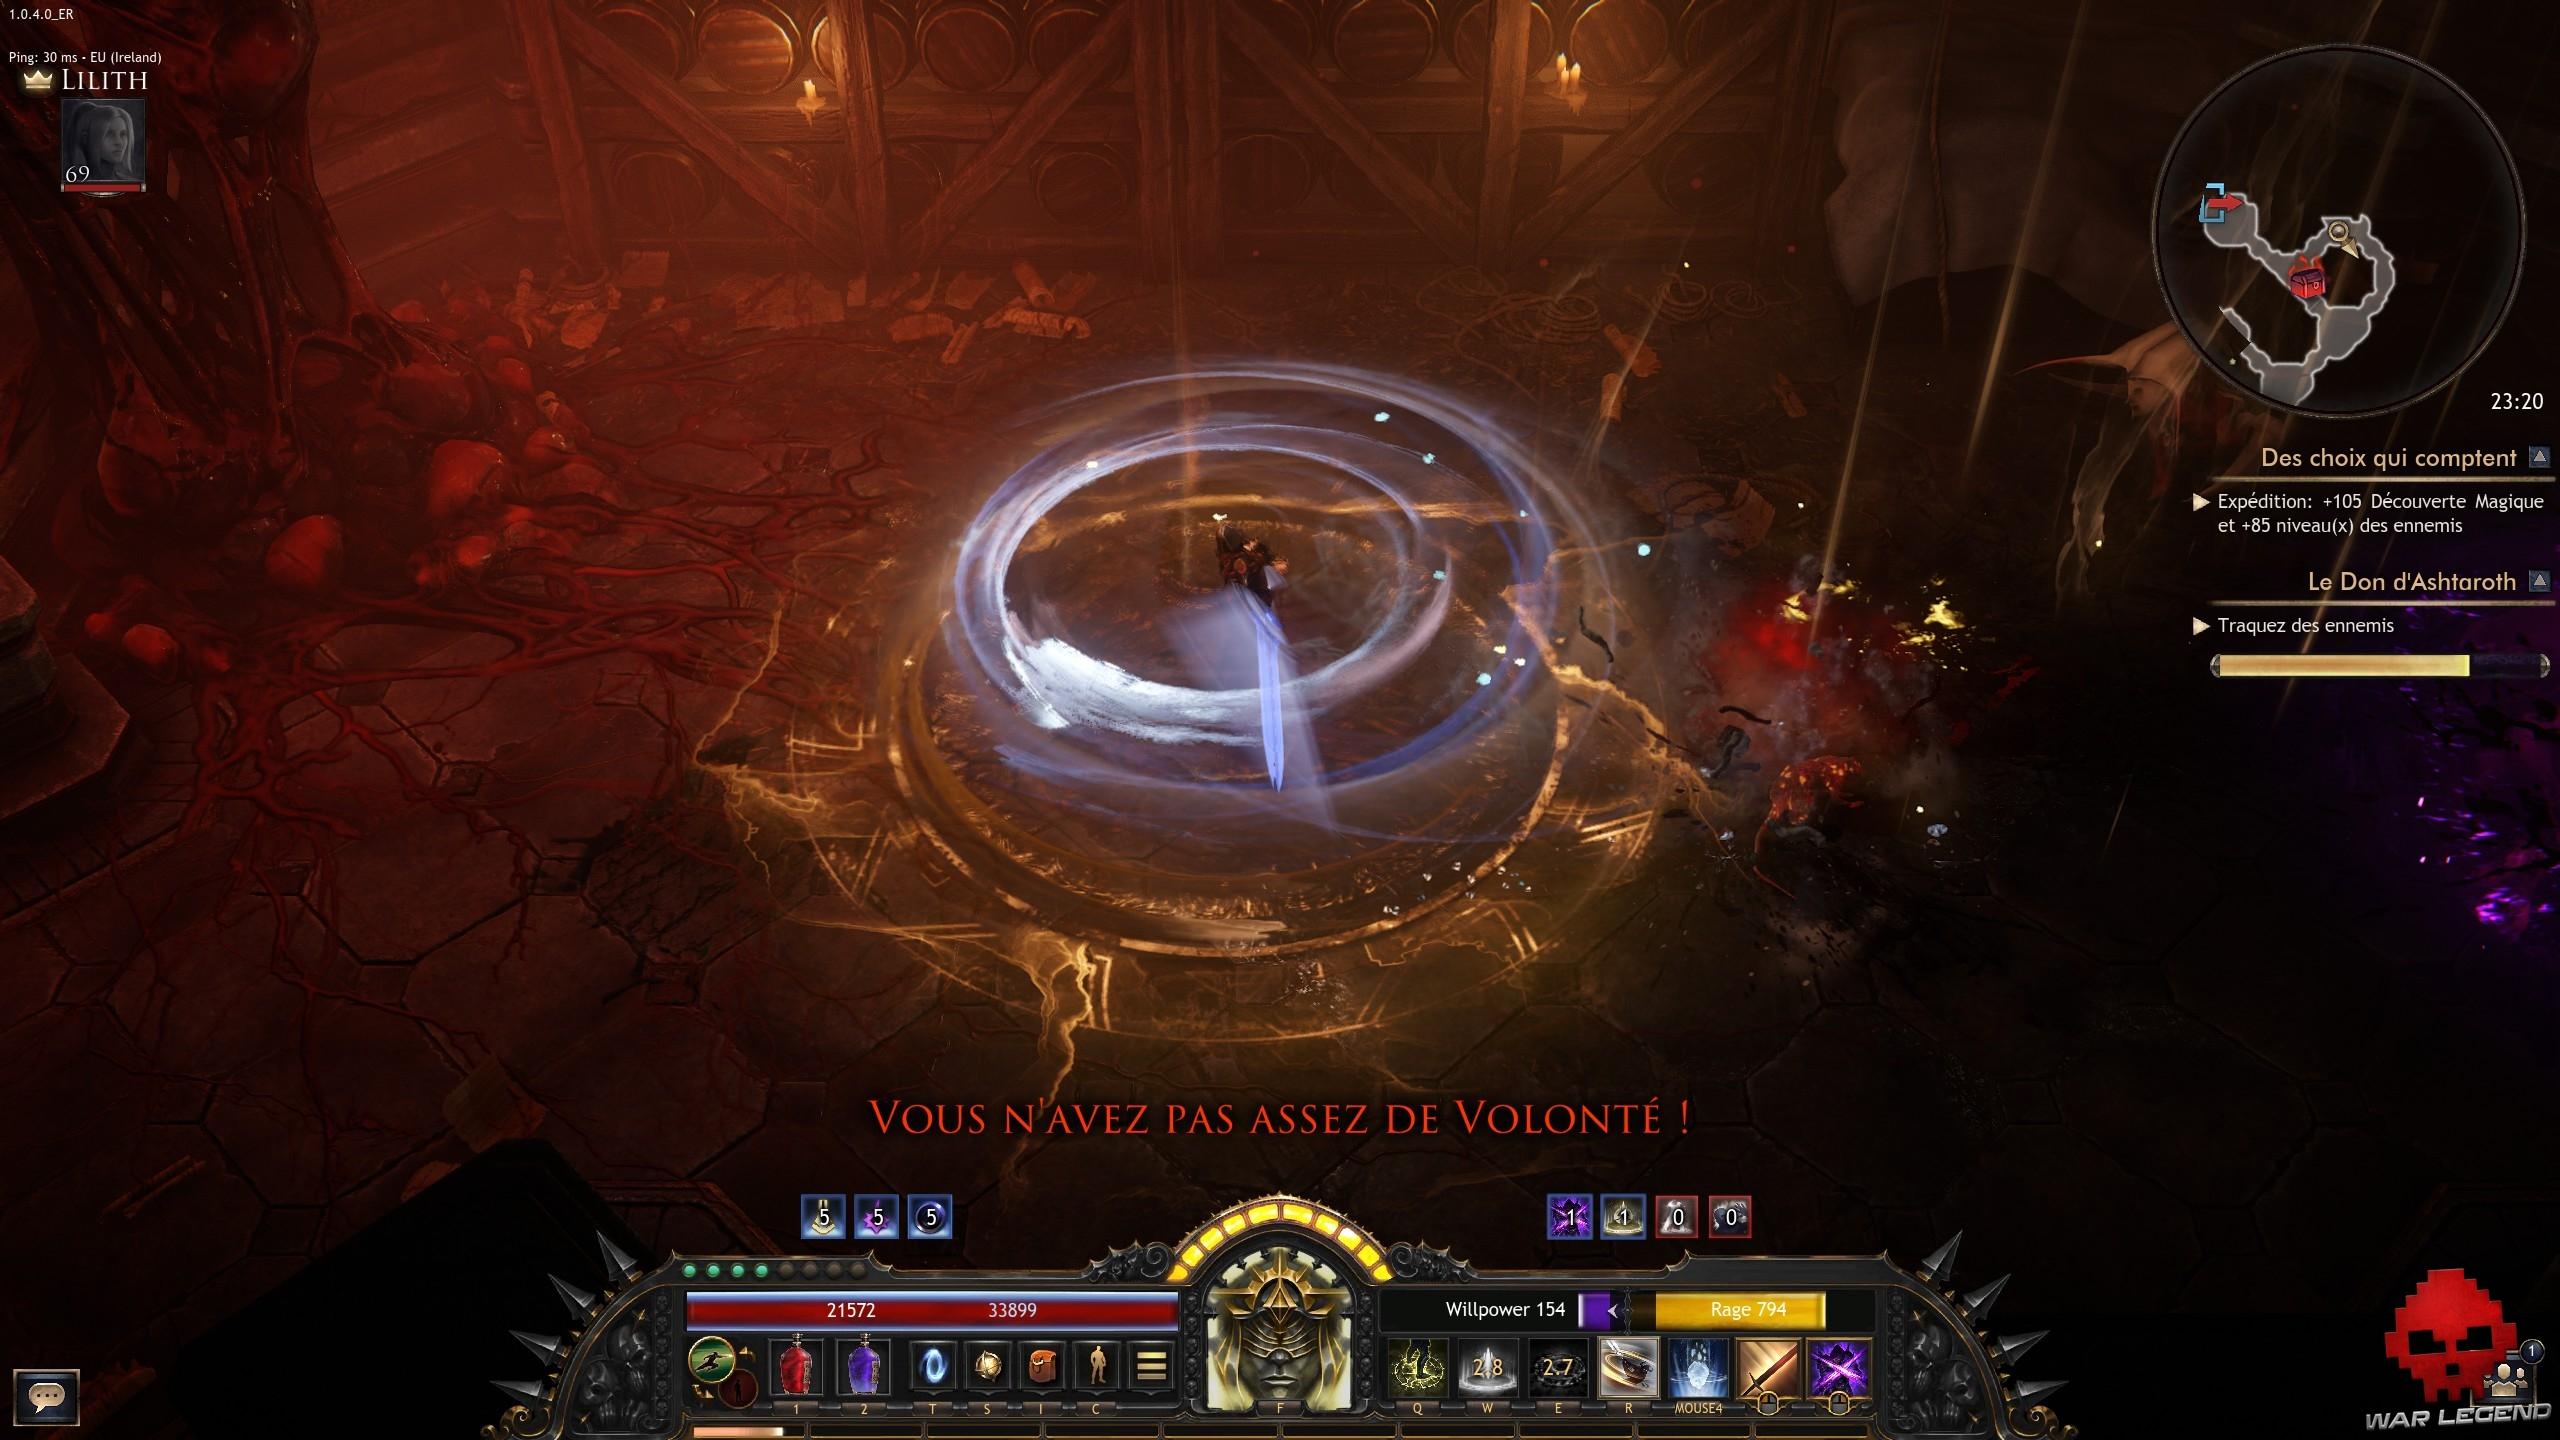 WL wolcen lords of mayhem build hybride